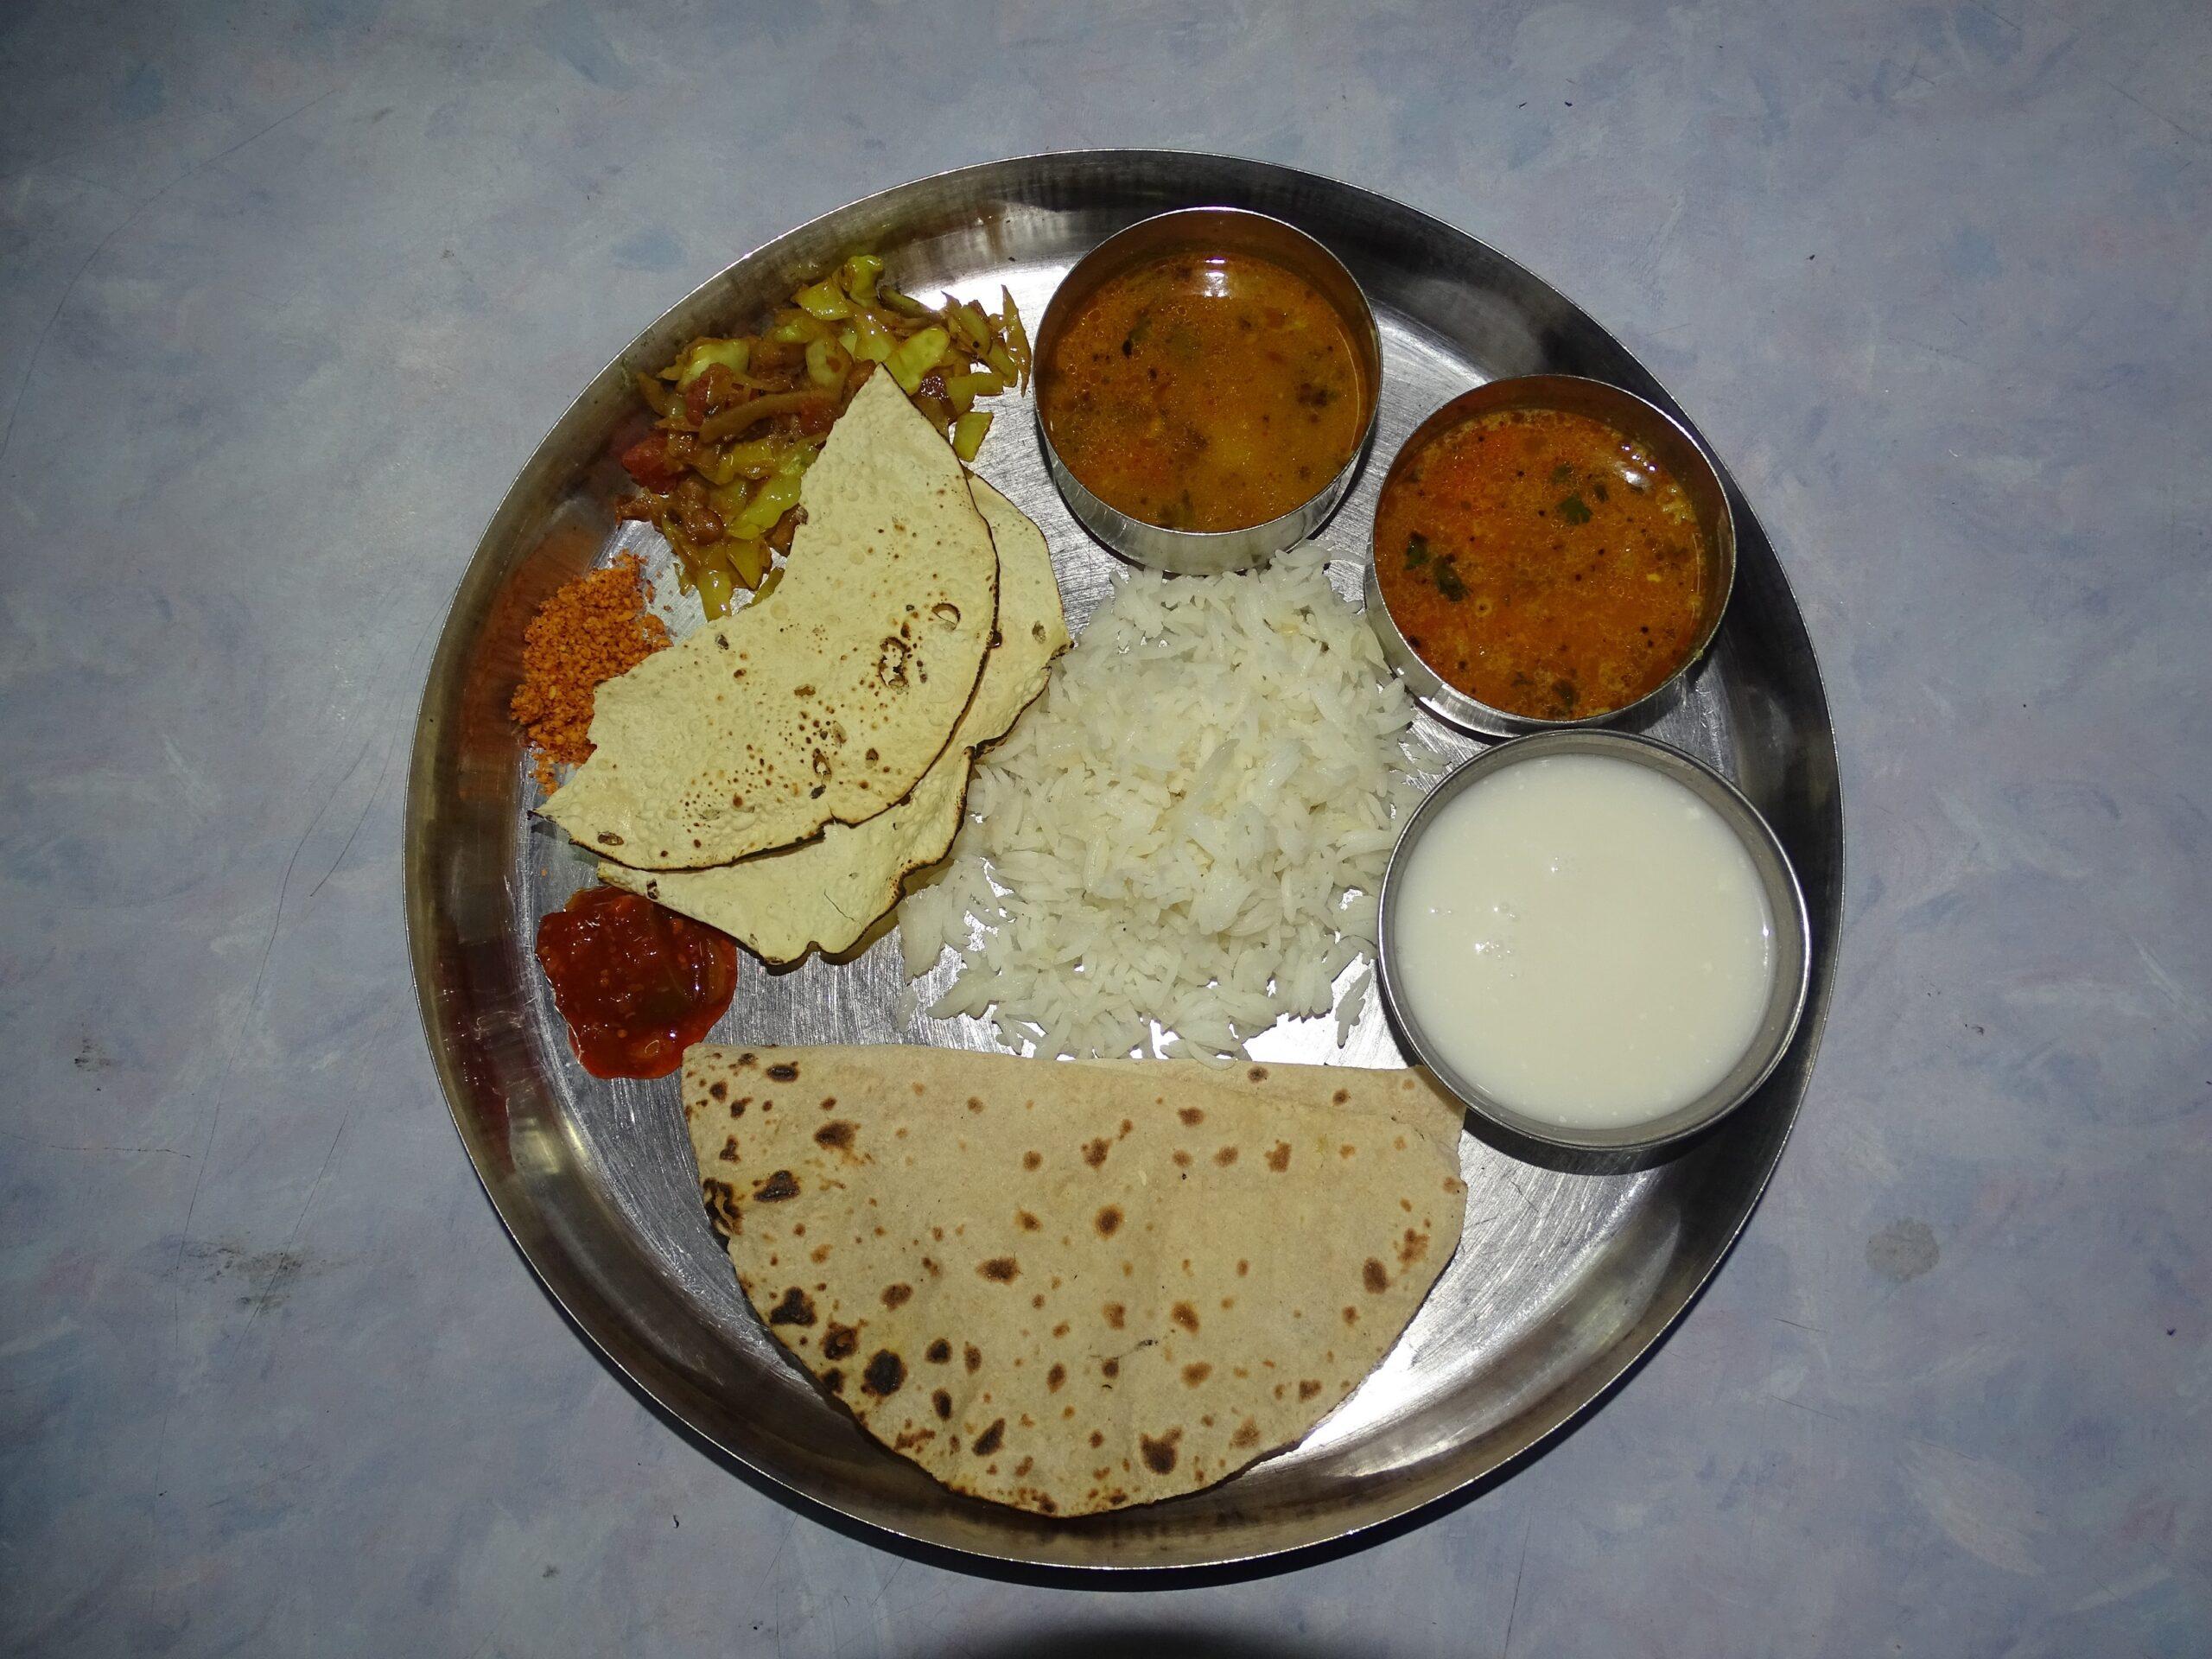 Dinner at Shri Yogeshwari Yatri Niwas (Ambajogai, Maharashtra, India)